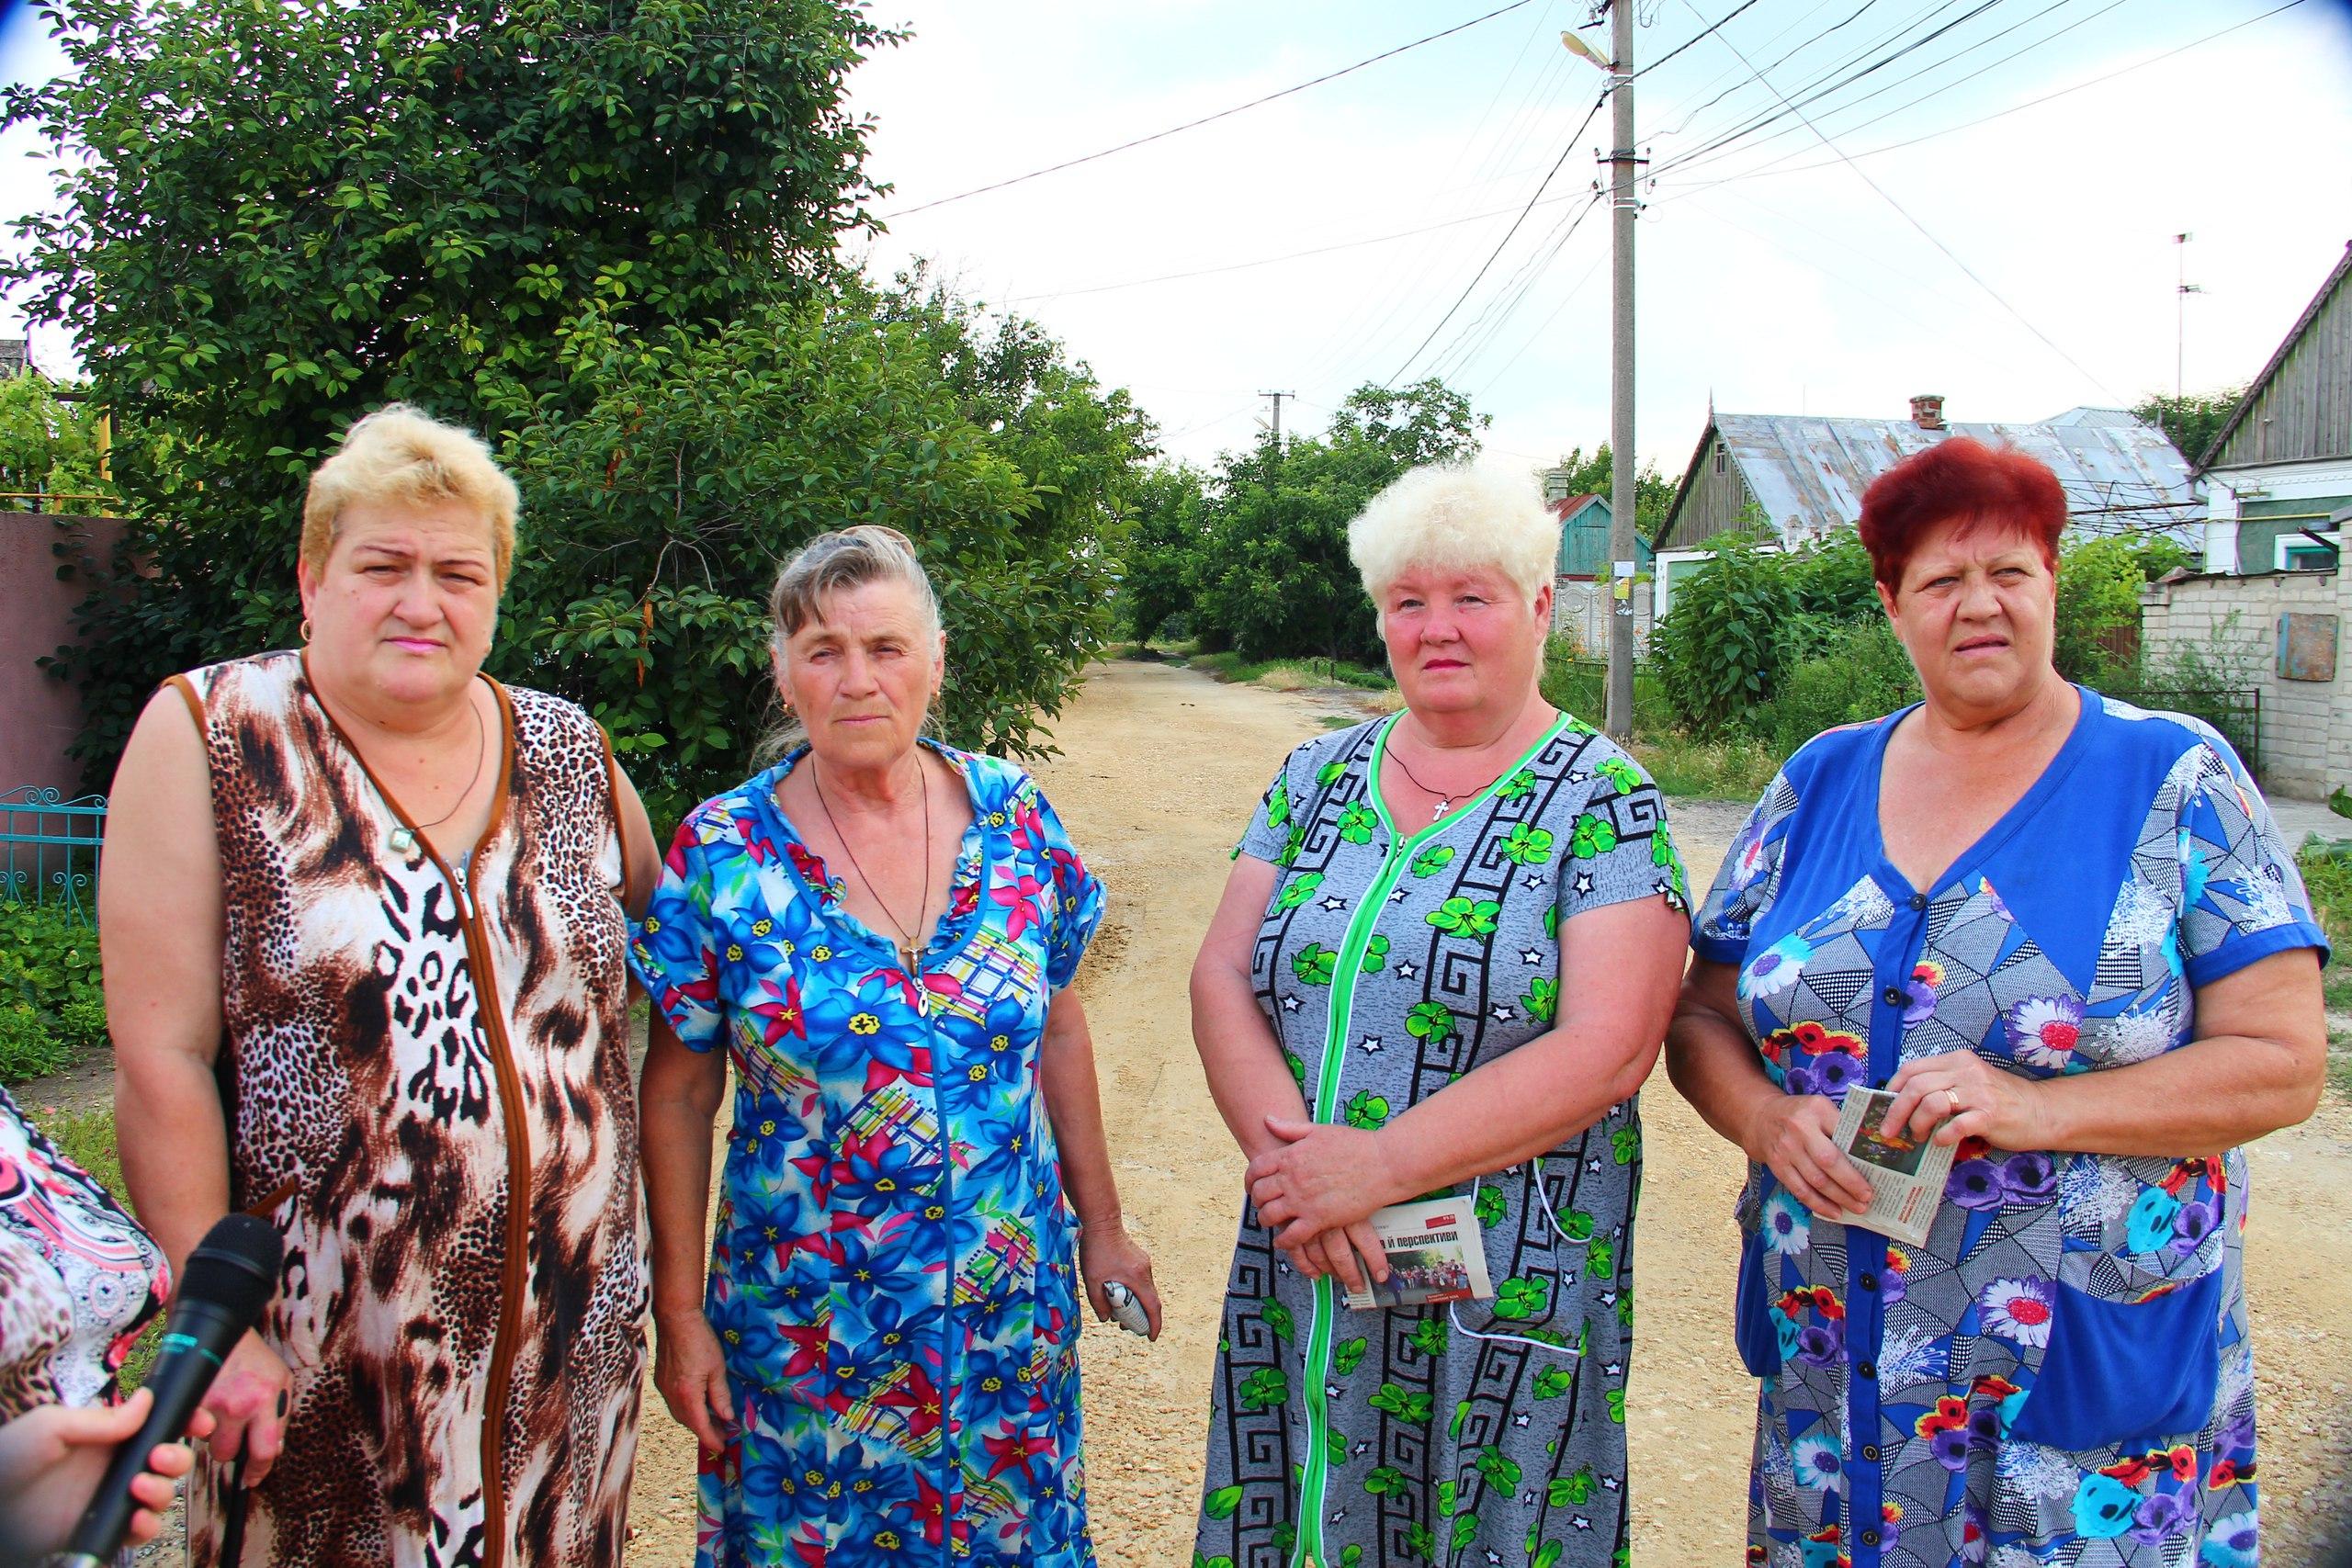 Жители поселка Антоновка дали «знак качества» главе поссовета, Слово и Дело (видео)